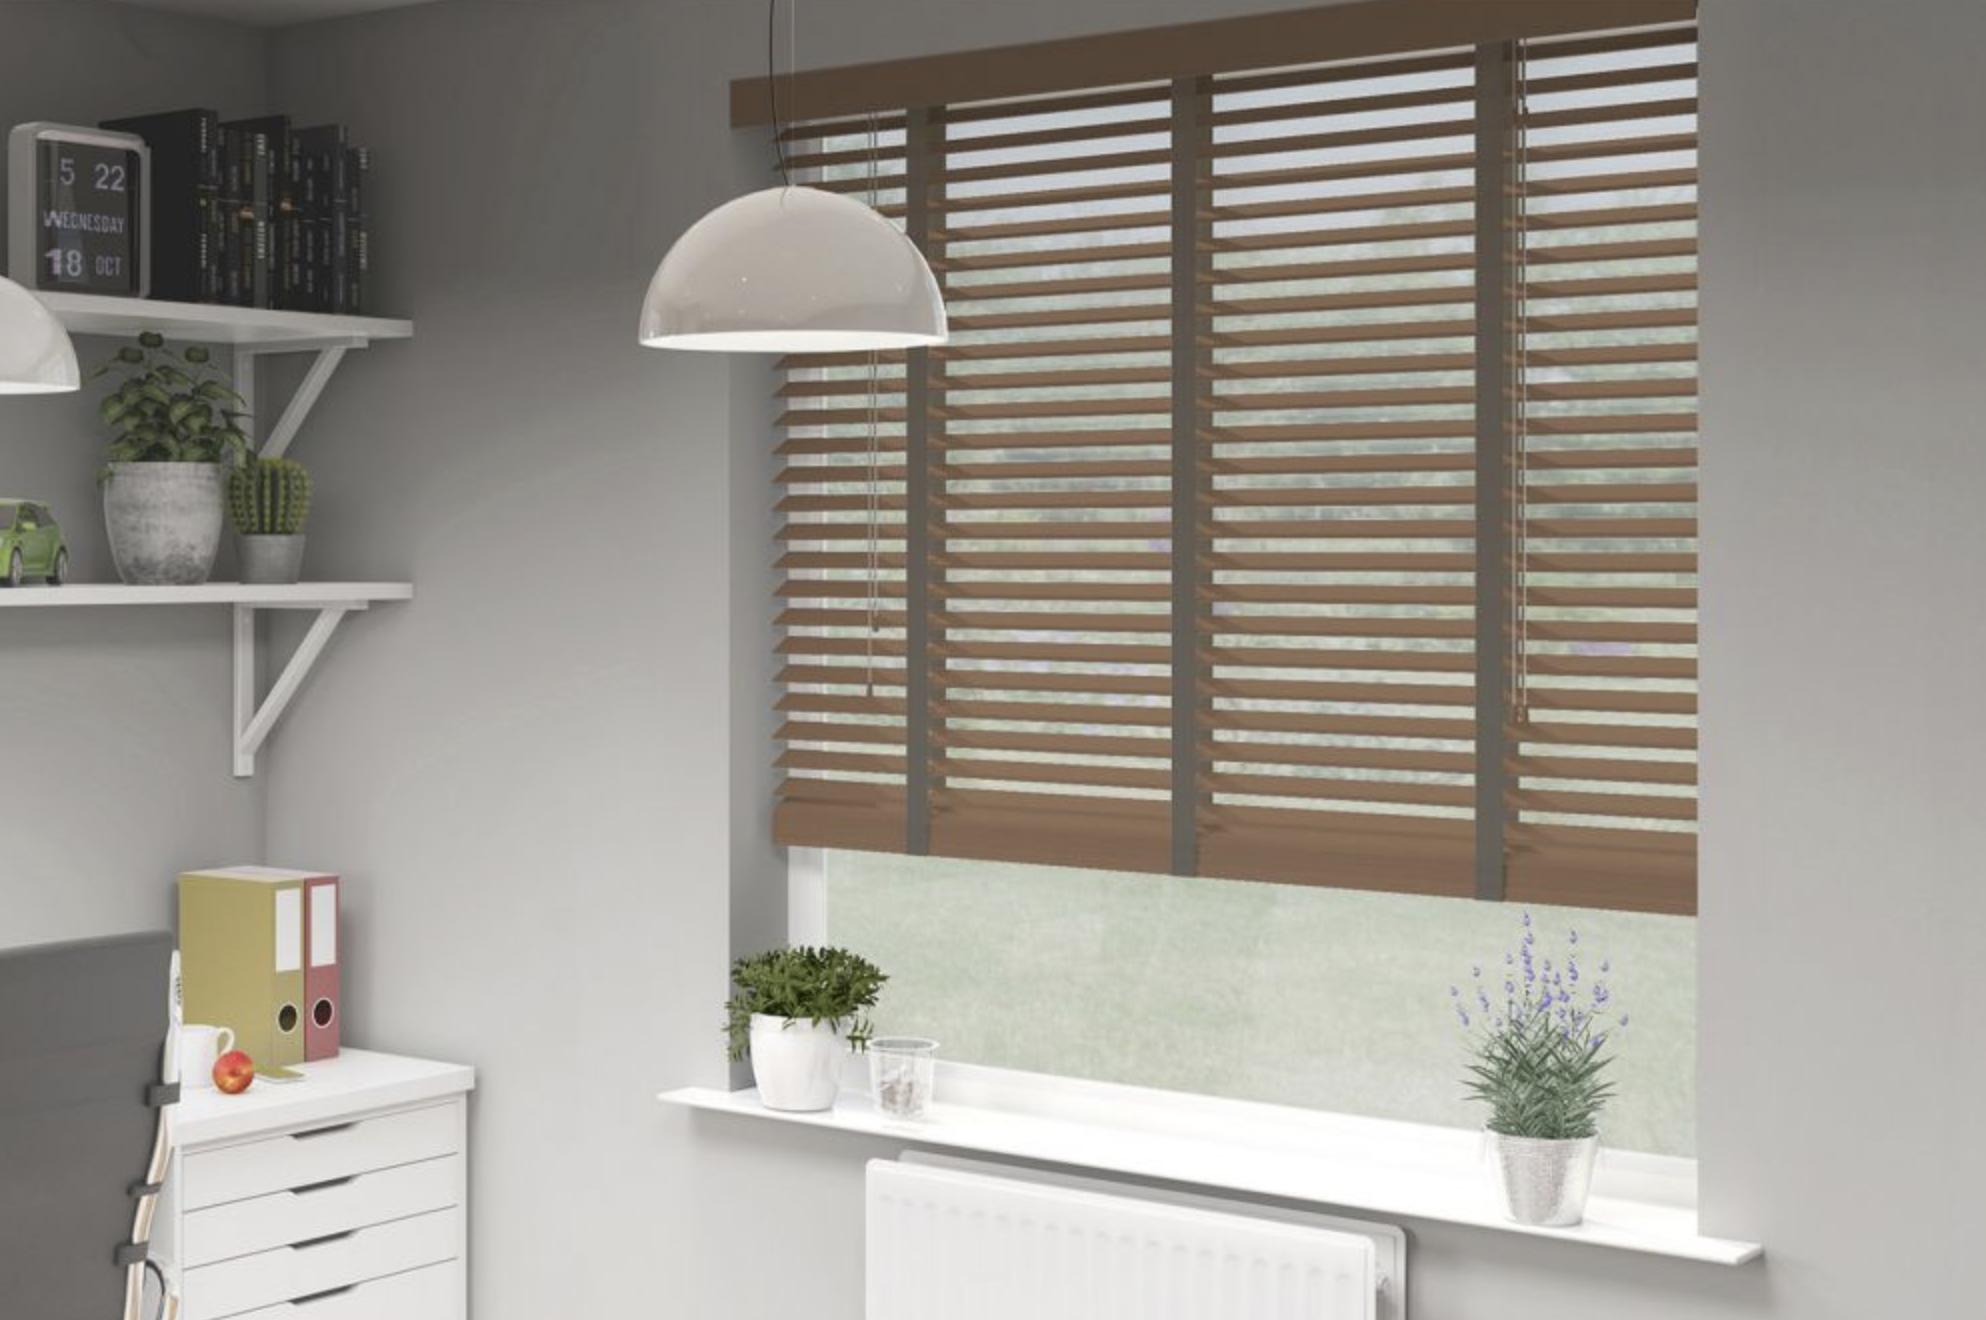 Wood slats make Venetian blinds an eco friendly choice